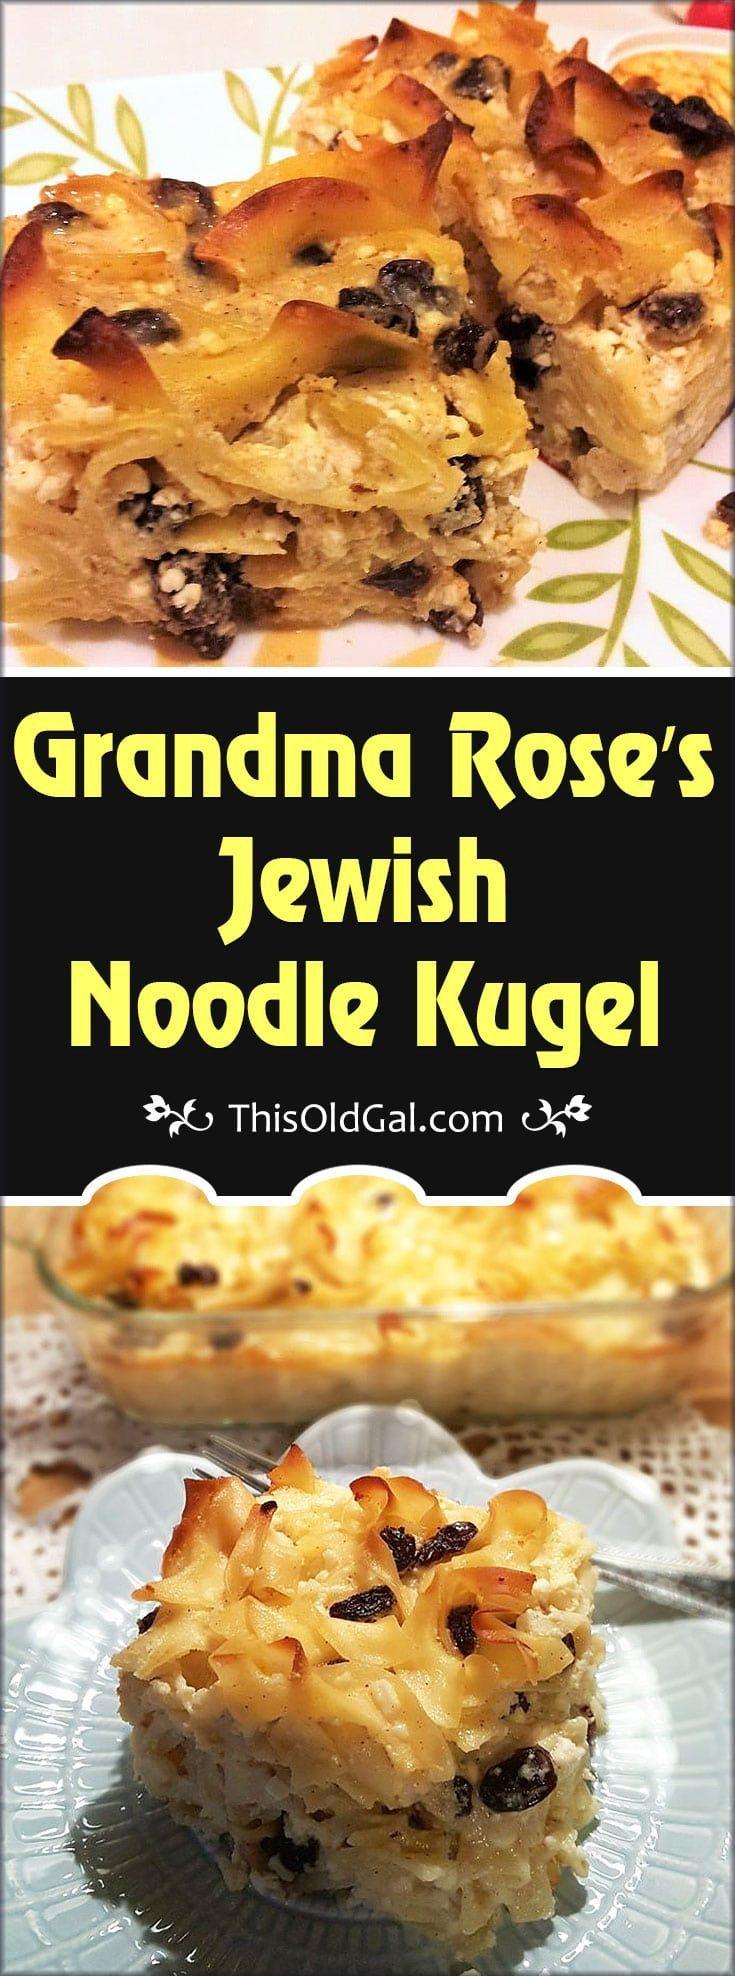 5203 best jewish recipes images on pinterest jewish recipes grandma roses jewish noodle kugel luchen kugel via thisoldgalcooks forumfinder Gallery